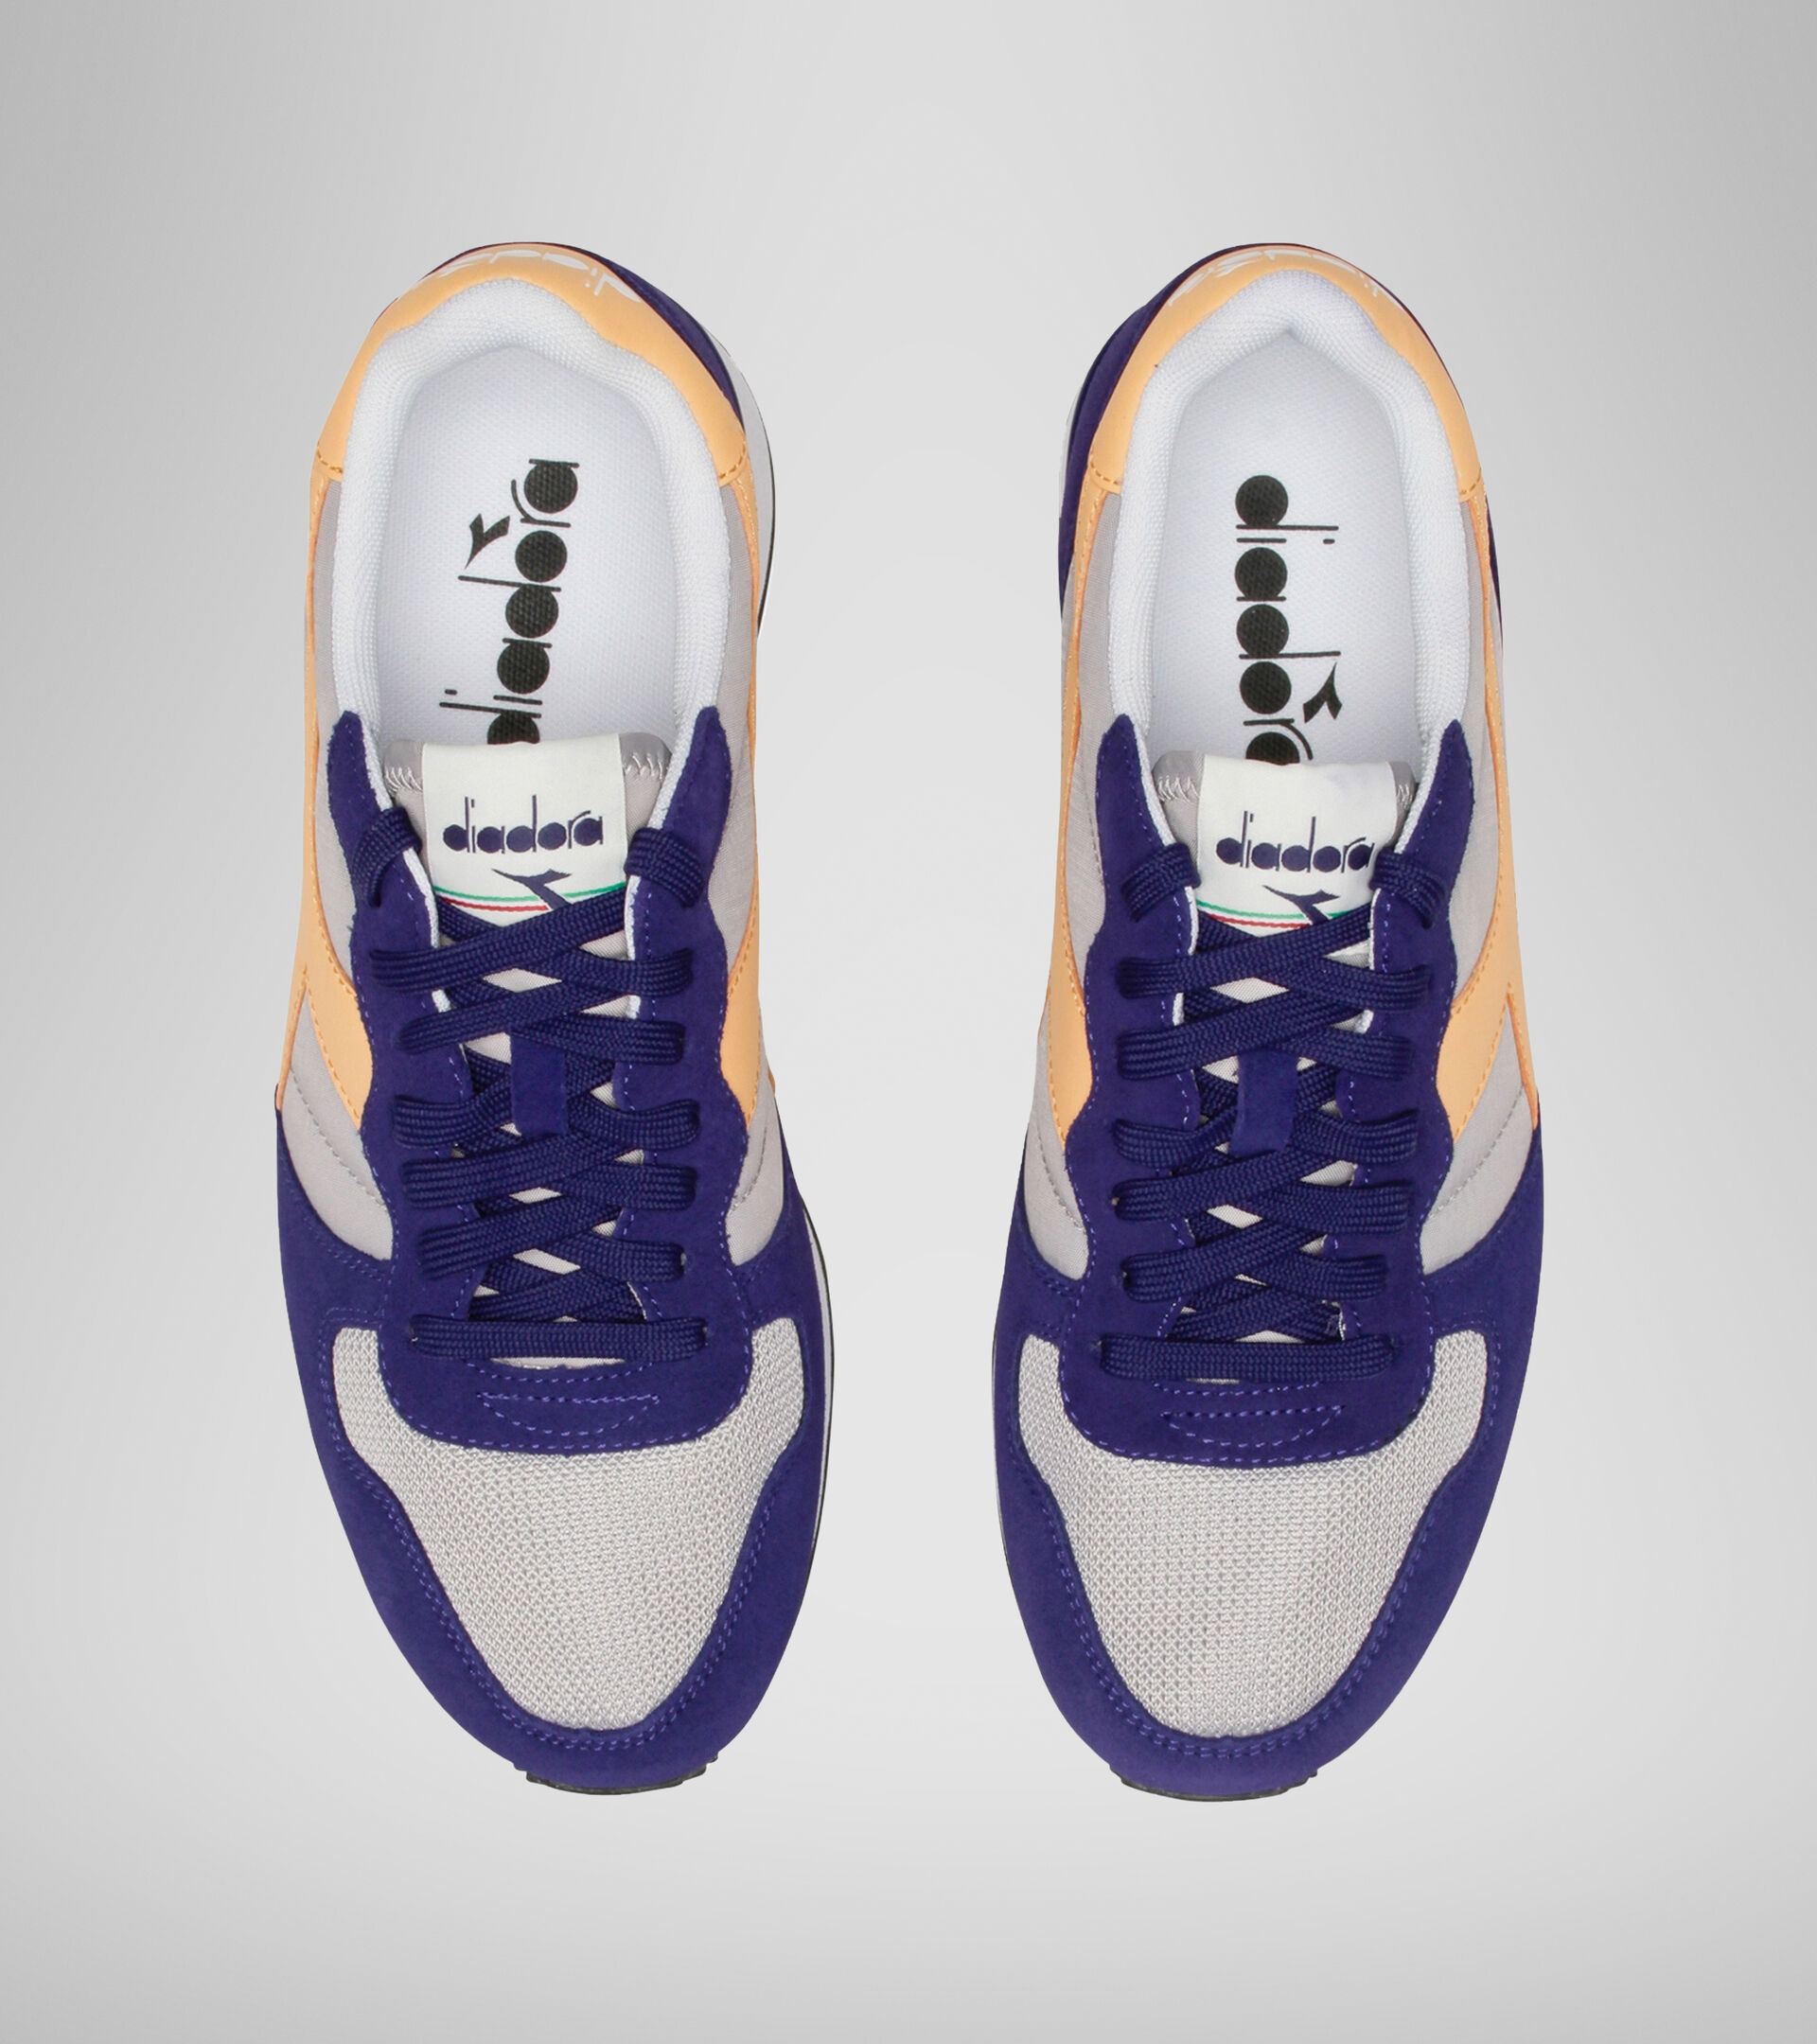 Footwear Sportswear UNISEX CAMARO DP WISTERIA/SILVER SCONCE/CHAM Diadora